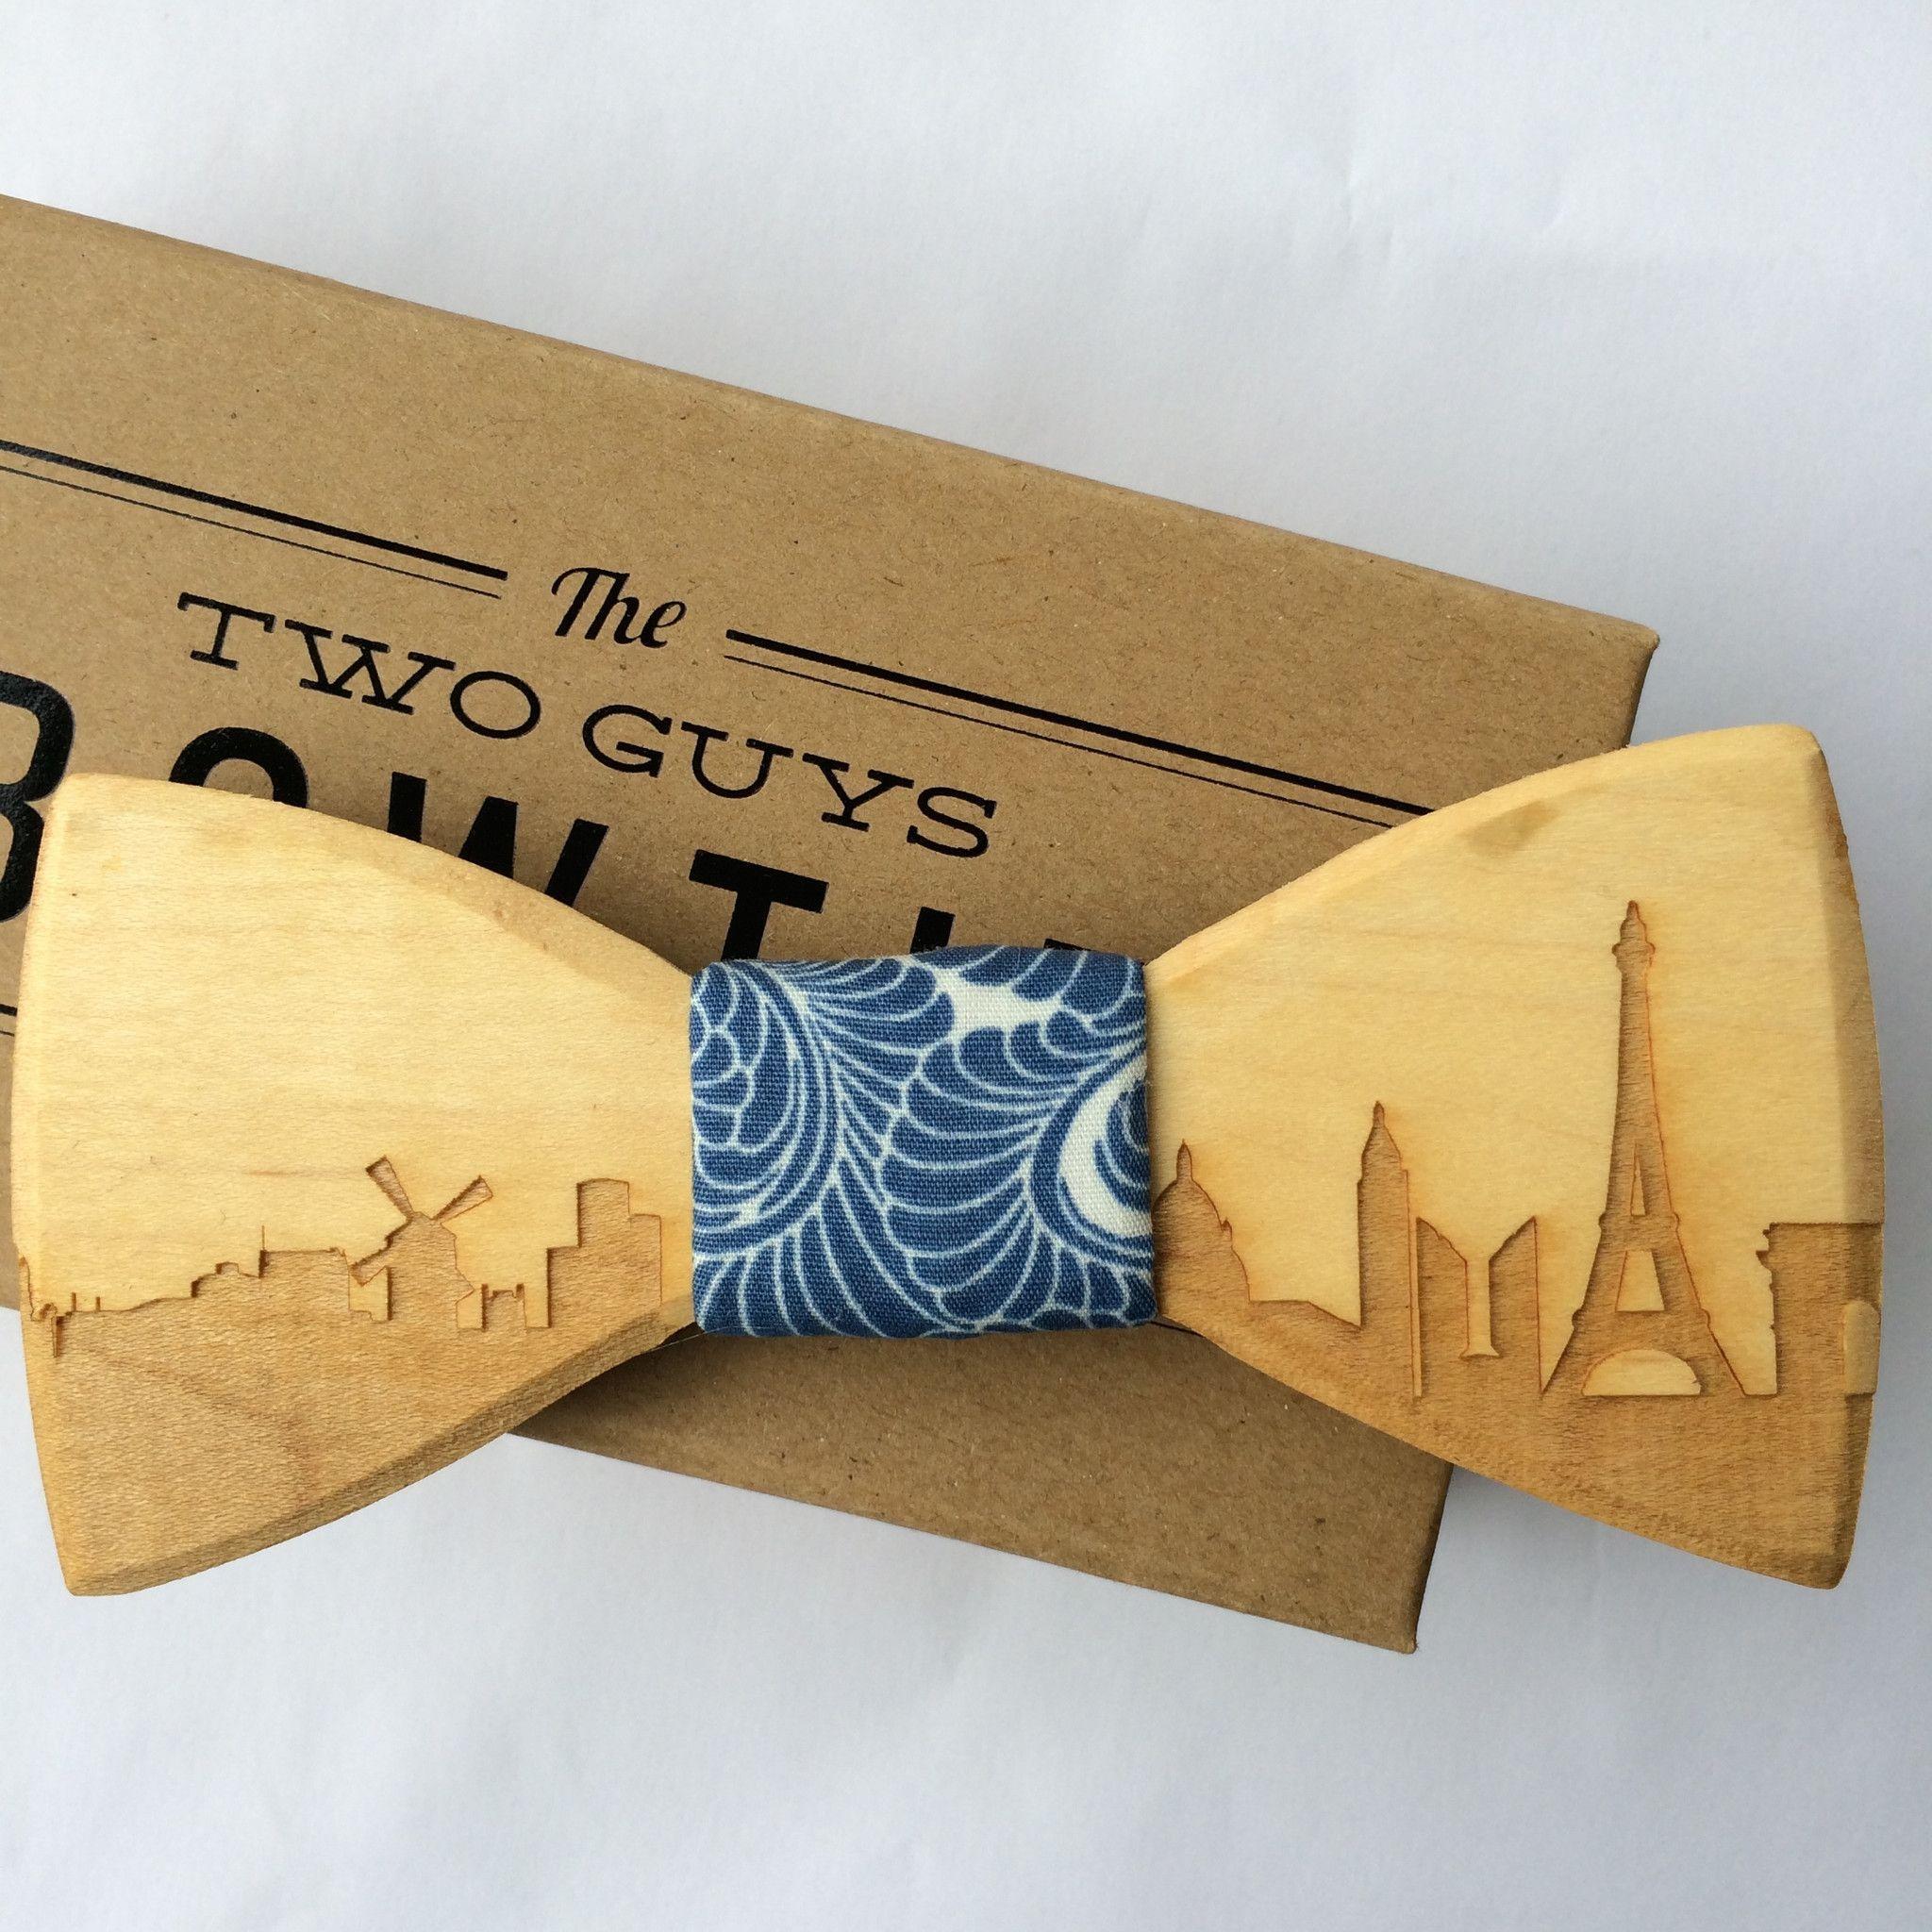 Paris Skyline Wooden Bow Tie | Dressed for success ...